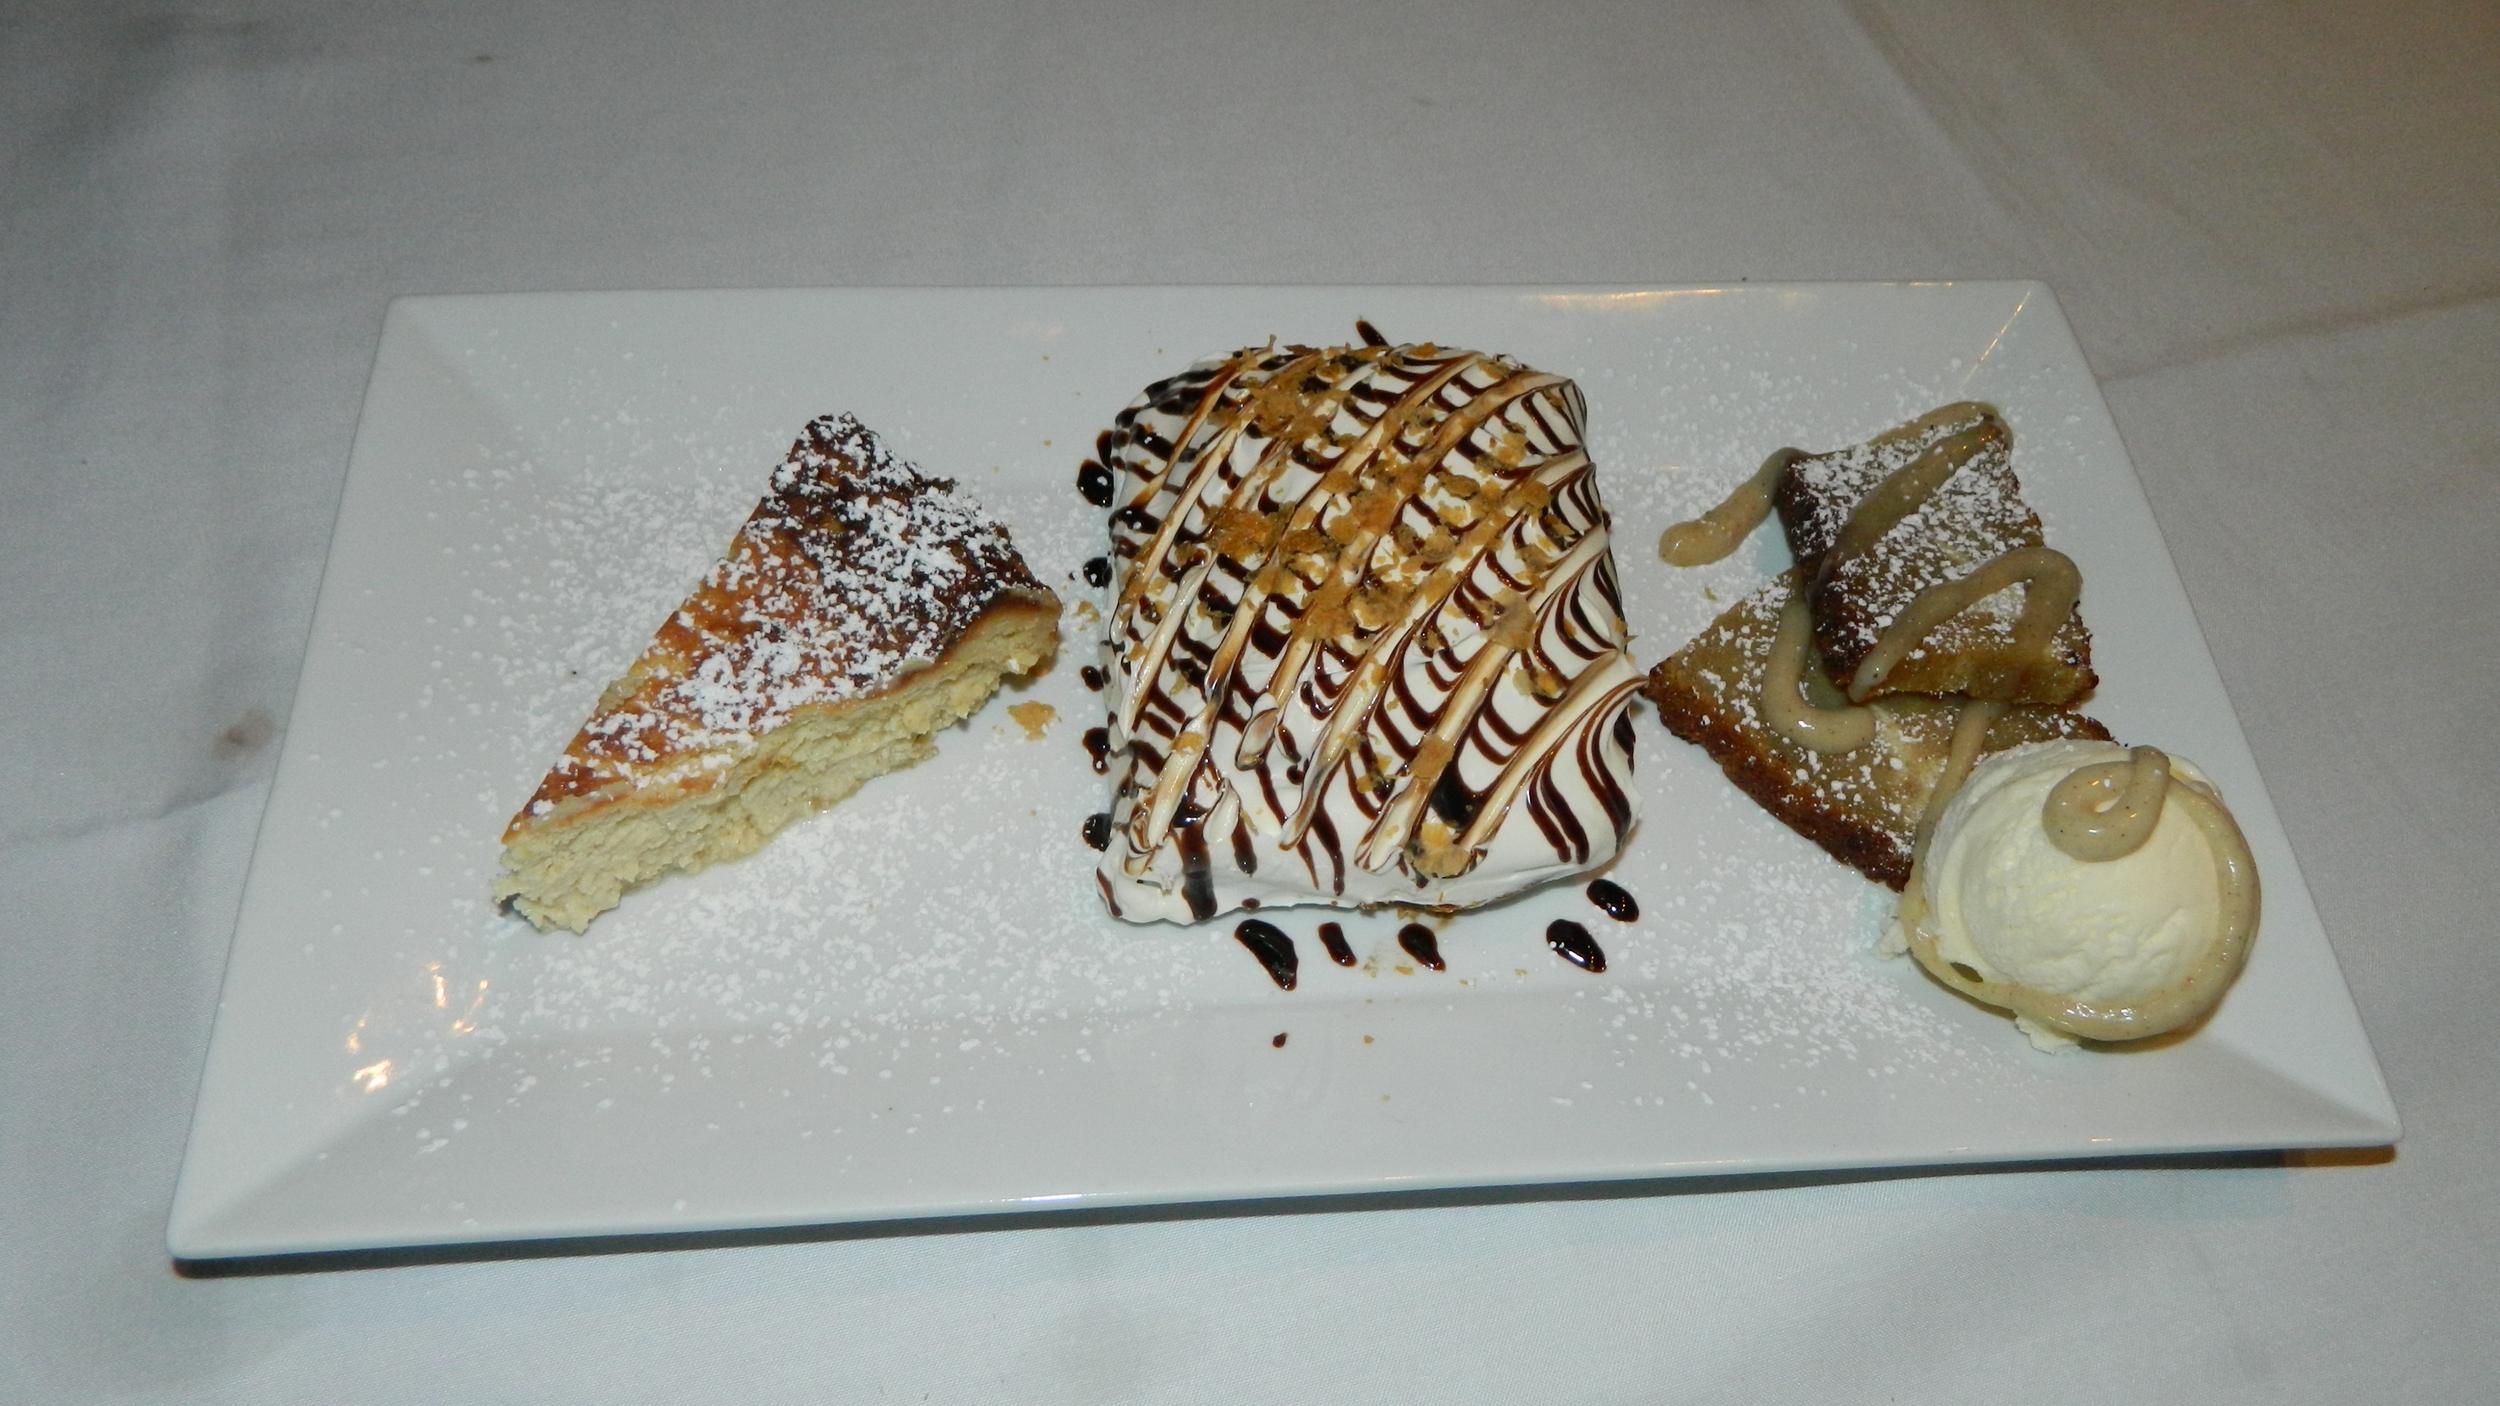 Italian cheesecake, Napoleon and banana bred pudding with vanilla ice cream.